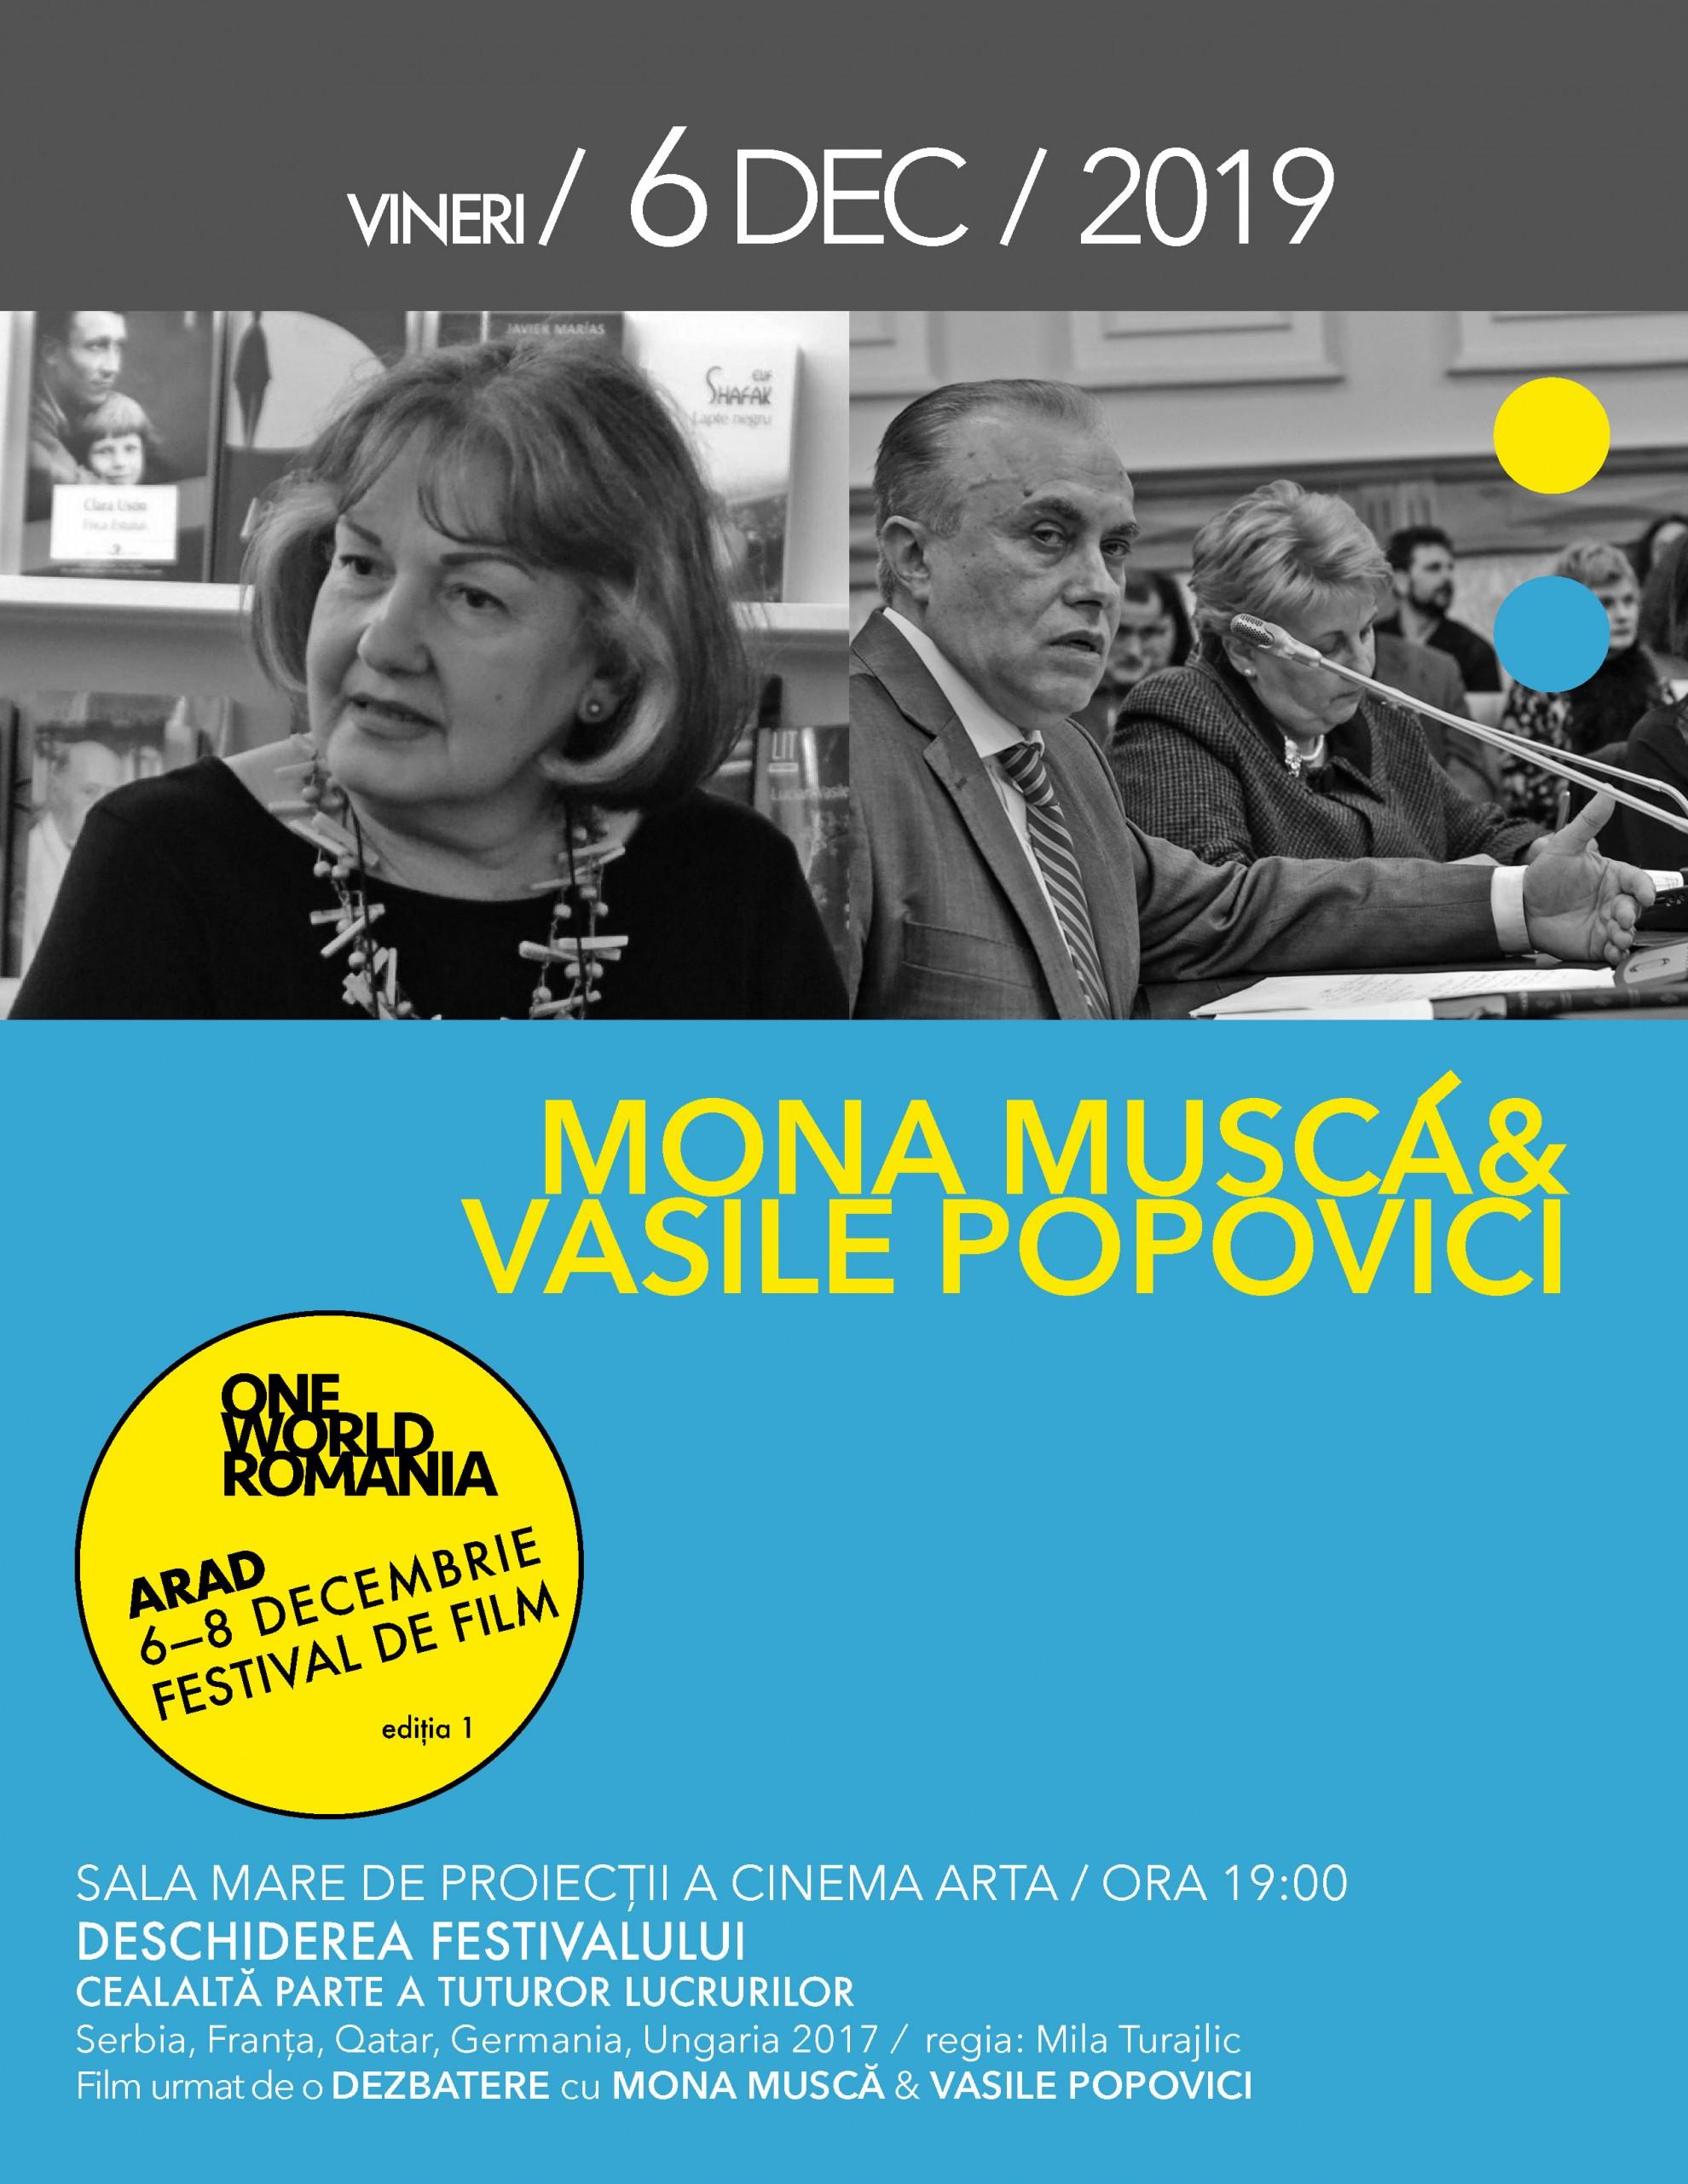 Mona Muscă, Vasile Popovici, Adriana Babeți și Ivana Mladenovic, printre invitații speciali ai primei ediții One World Romania la Arad